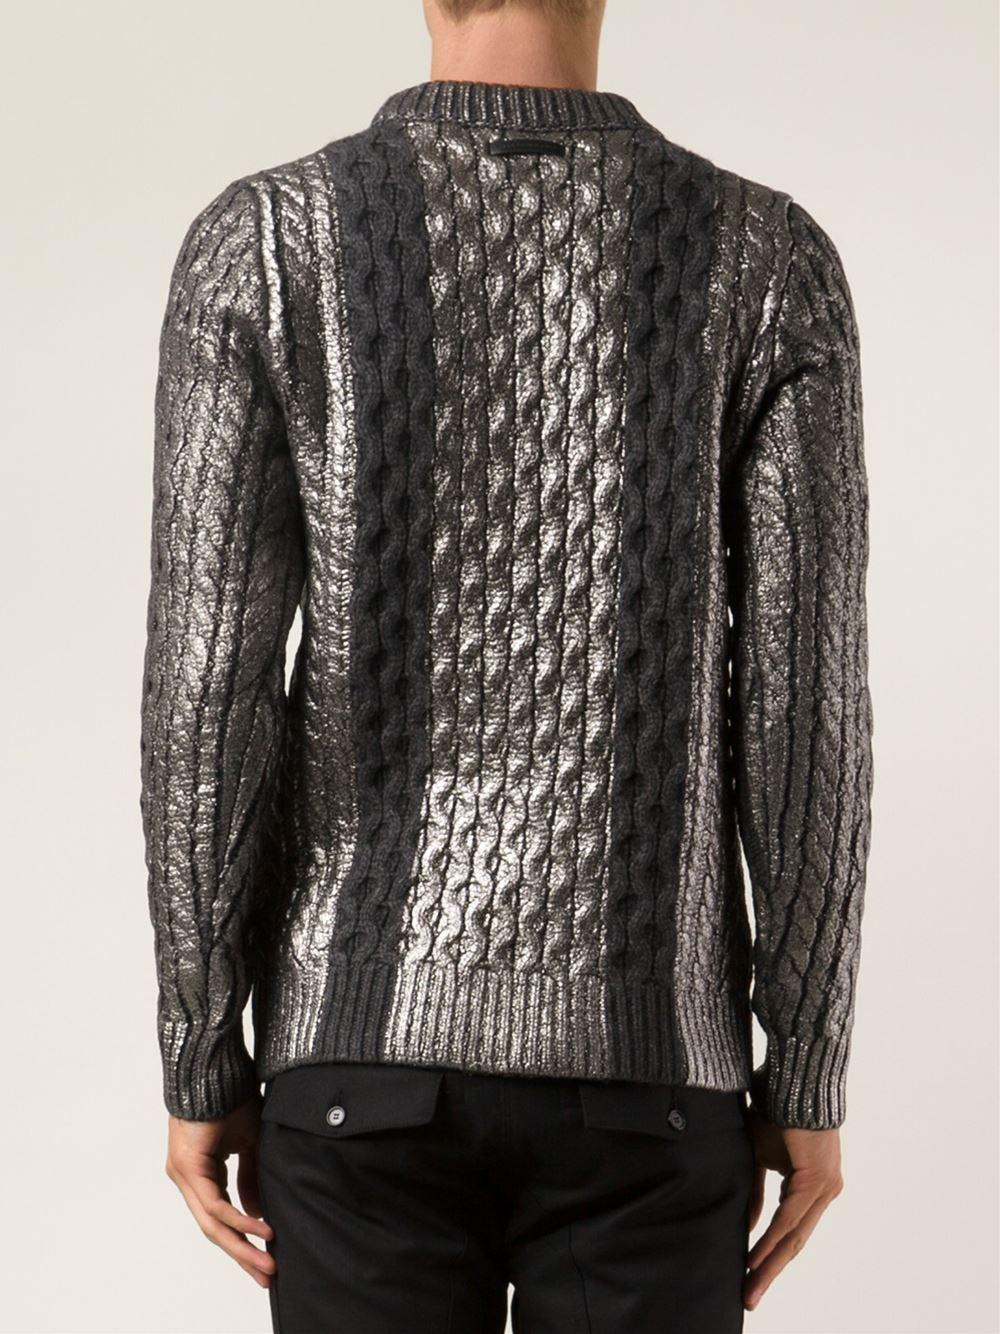 Diesel black gold Metallic Sweater in Gray for Men | Lyst